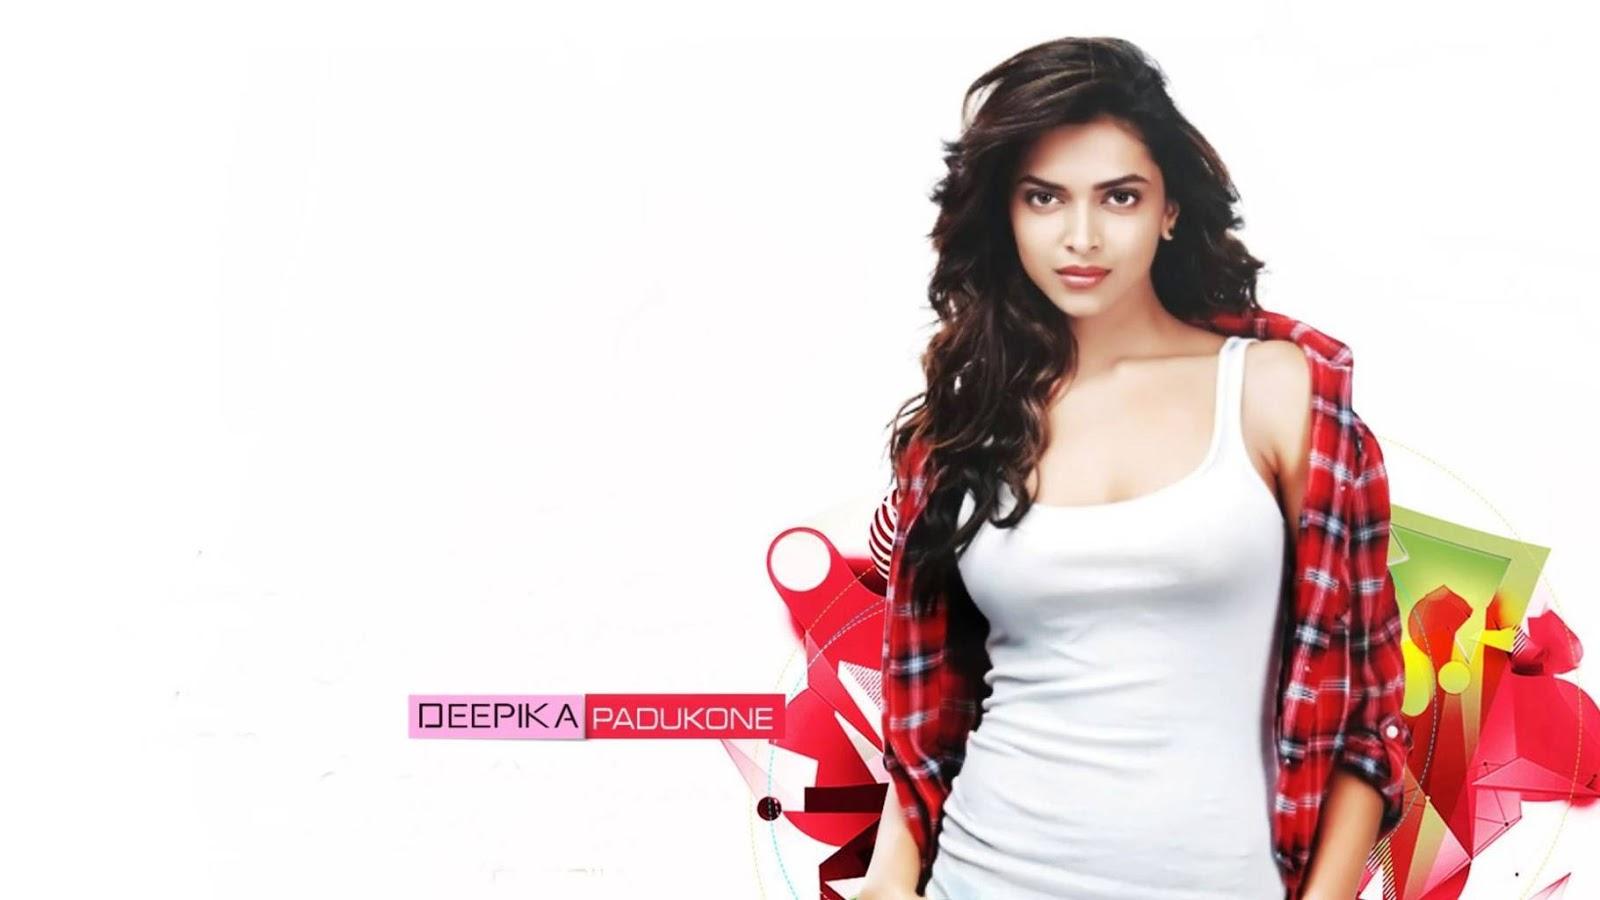 deepika name wallpaper,photo shoot,fashion model,photography,long hair,black hair